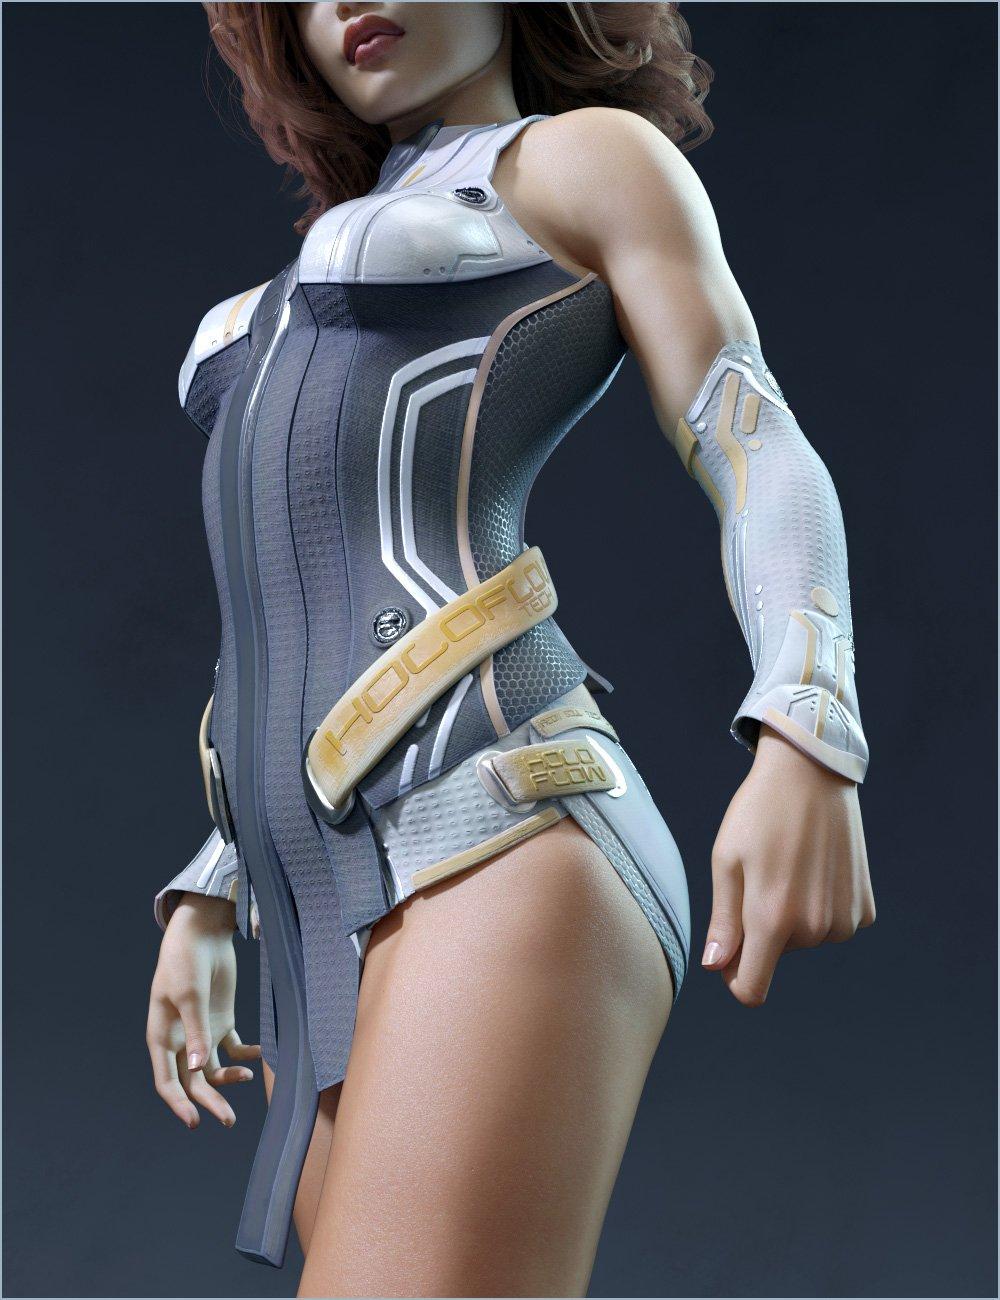 HoloFlow for Genesis 8 Female(s) by: Aeon Soul, 3D Models by Daz 3D